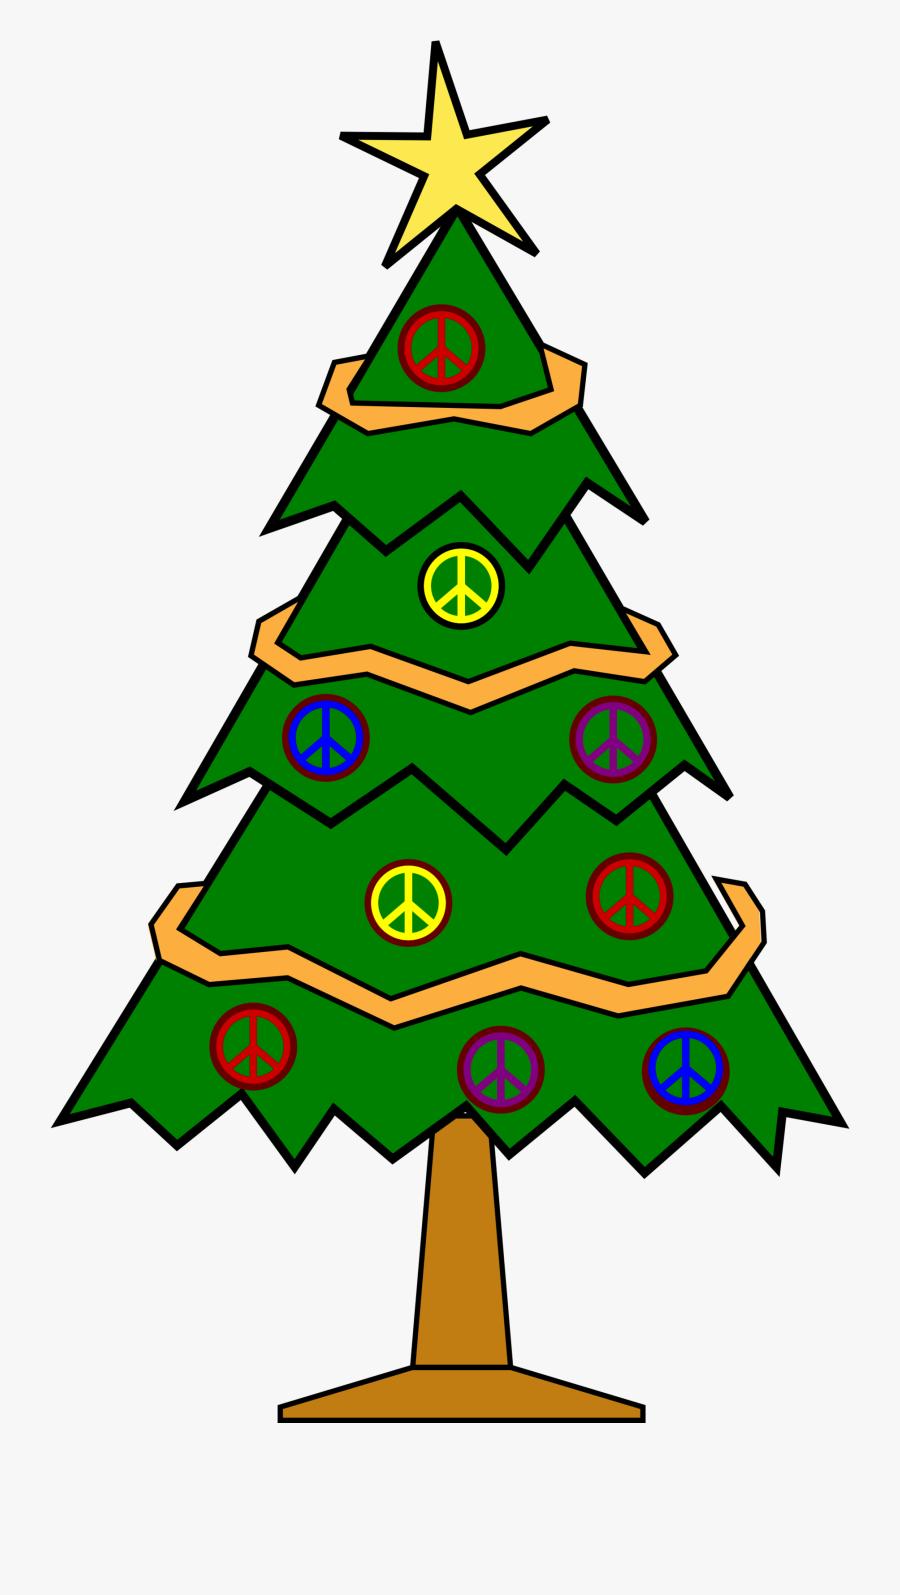 Christmas Tree Clipart Christmas Symbol - Christmas Tree Clipart Small, Transparent Clipart